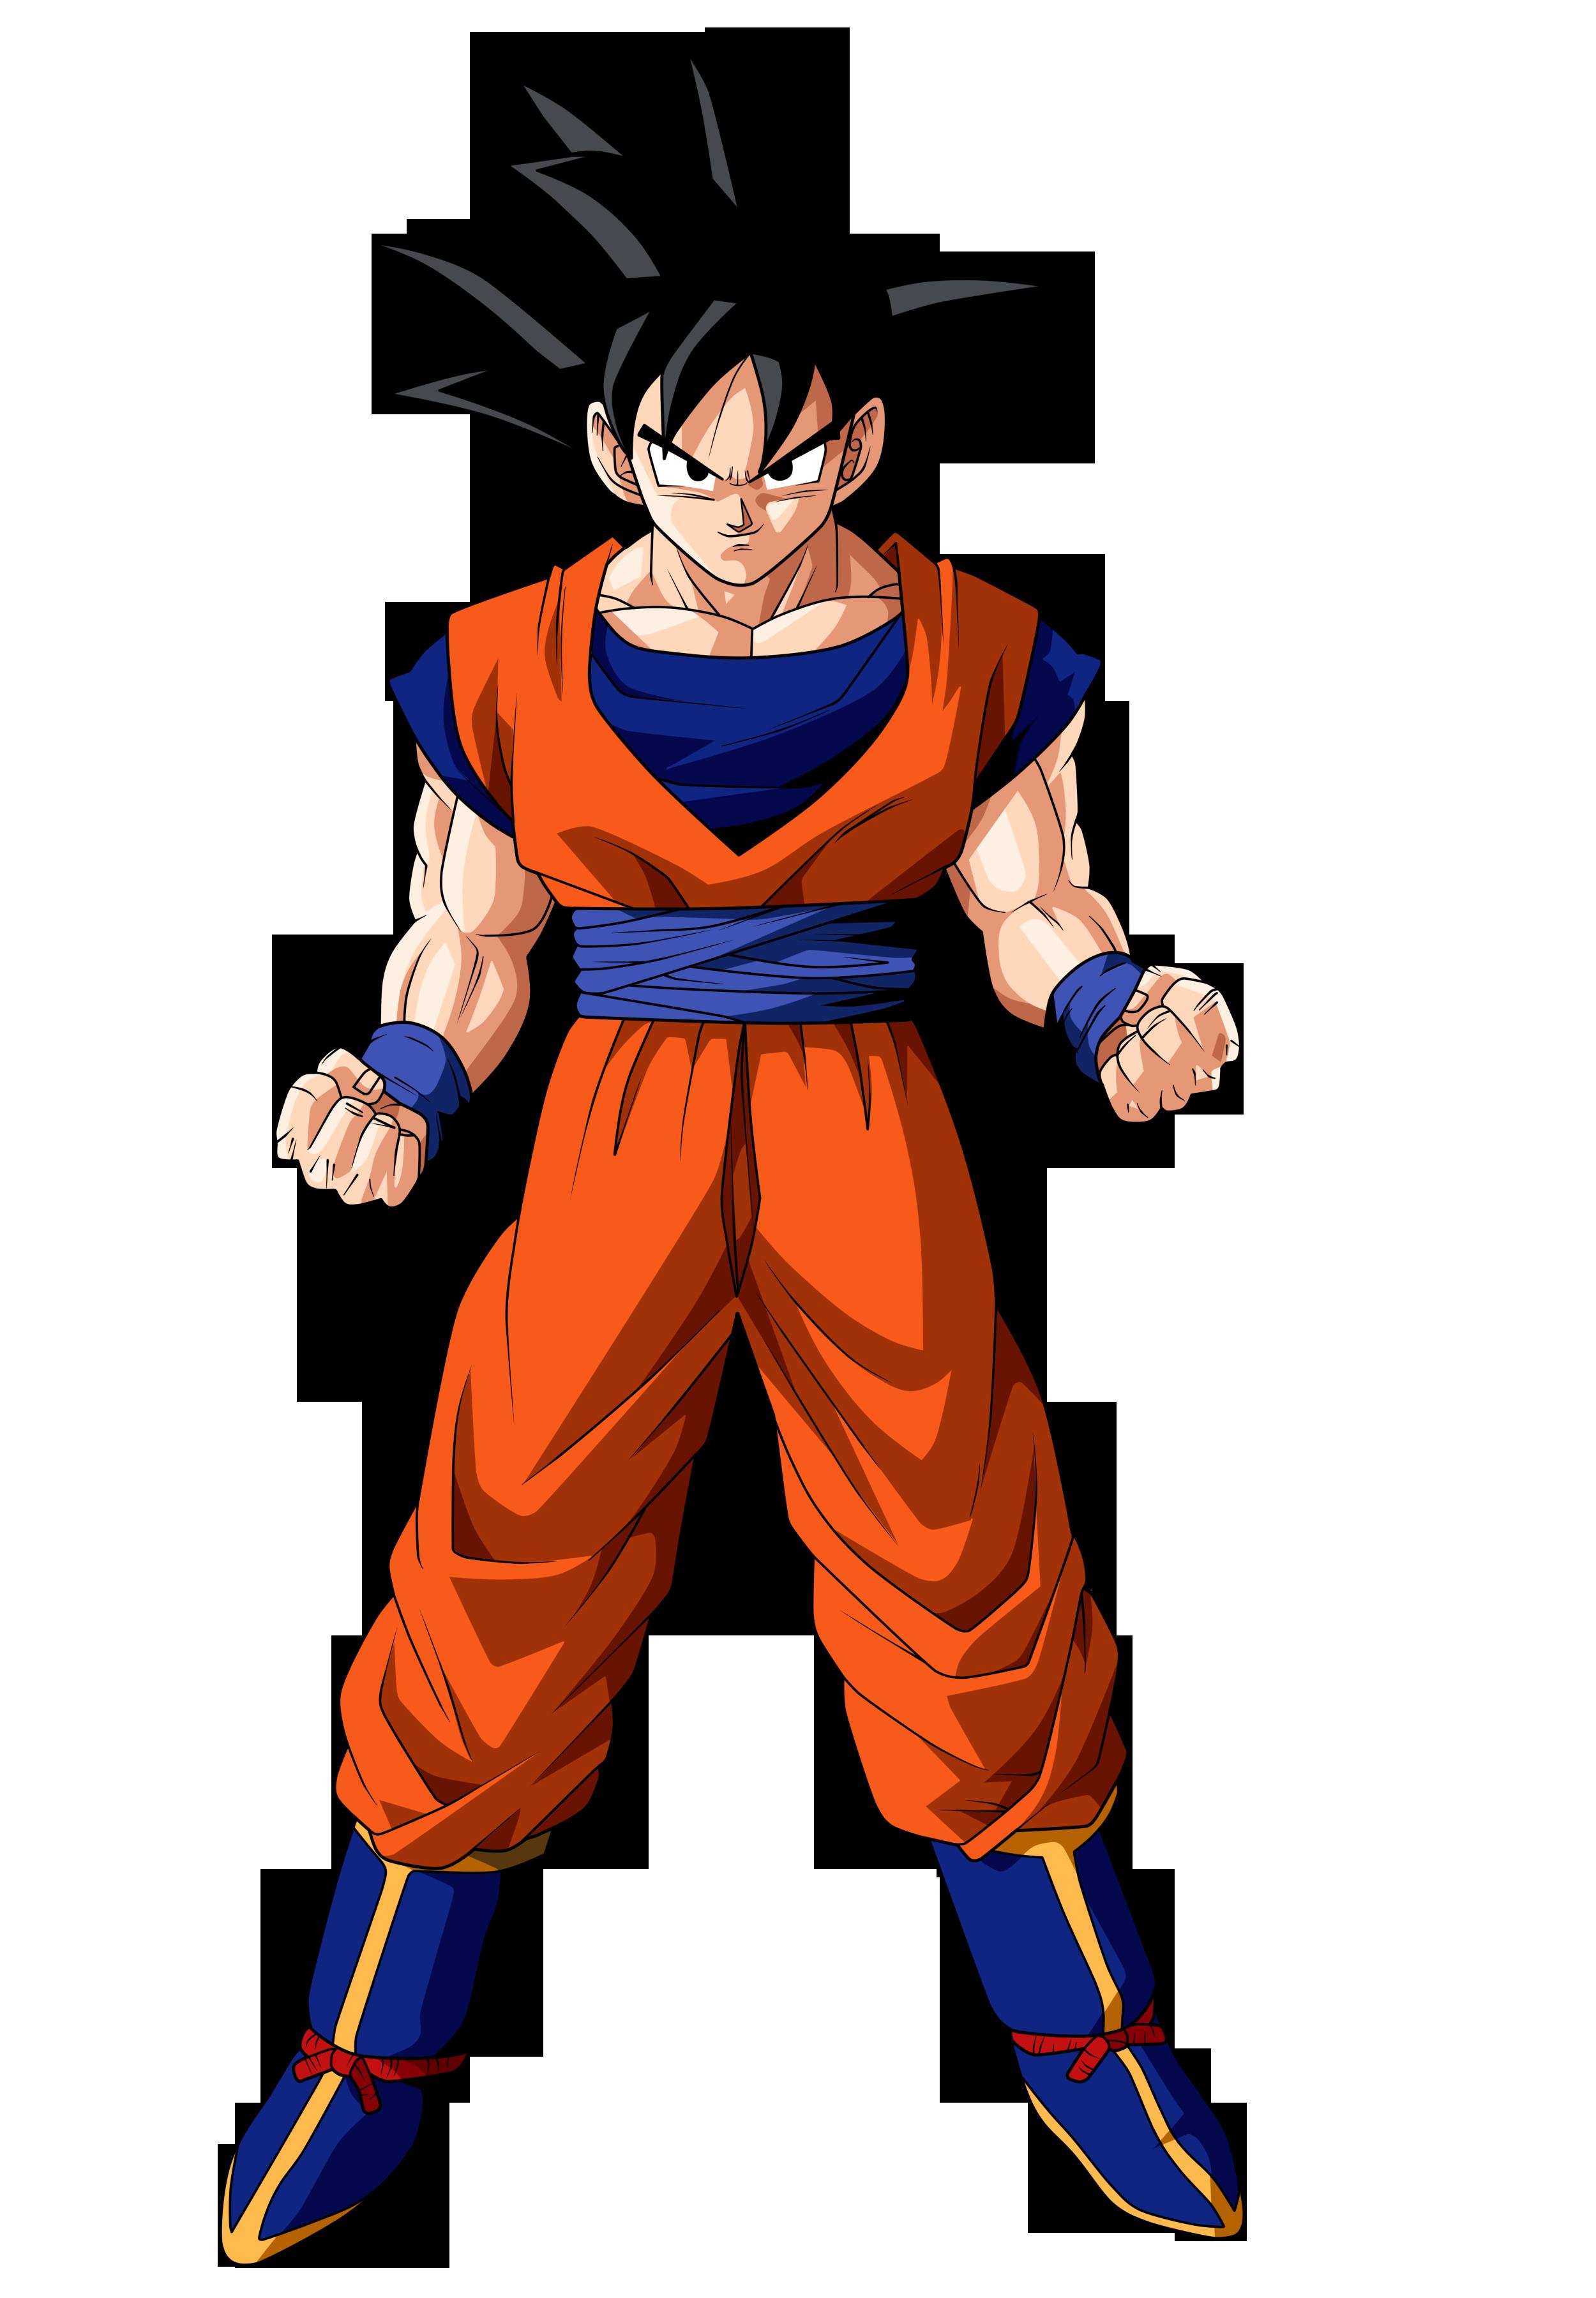 Download Goku Transparent Image HQ PNG Image | FreePNGImg